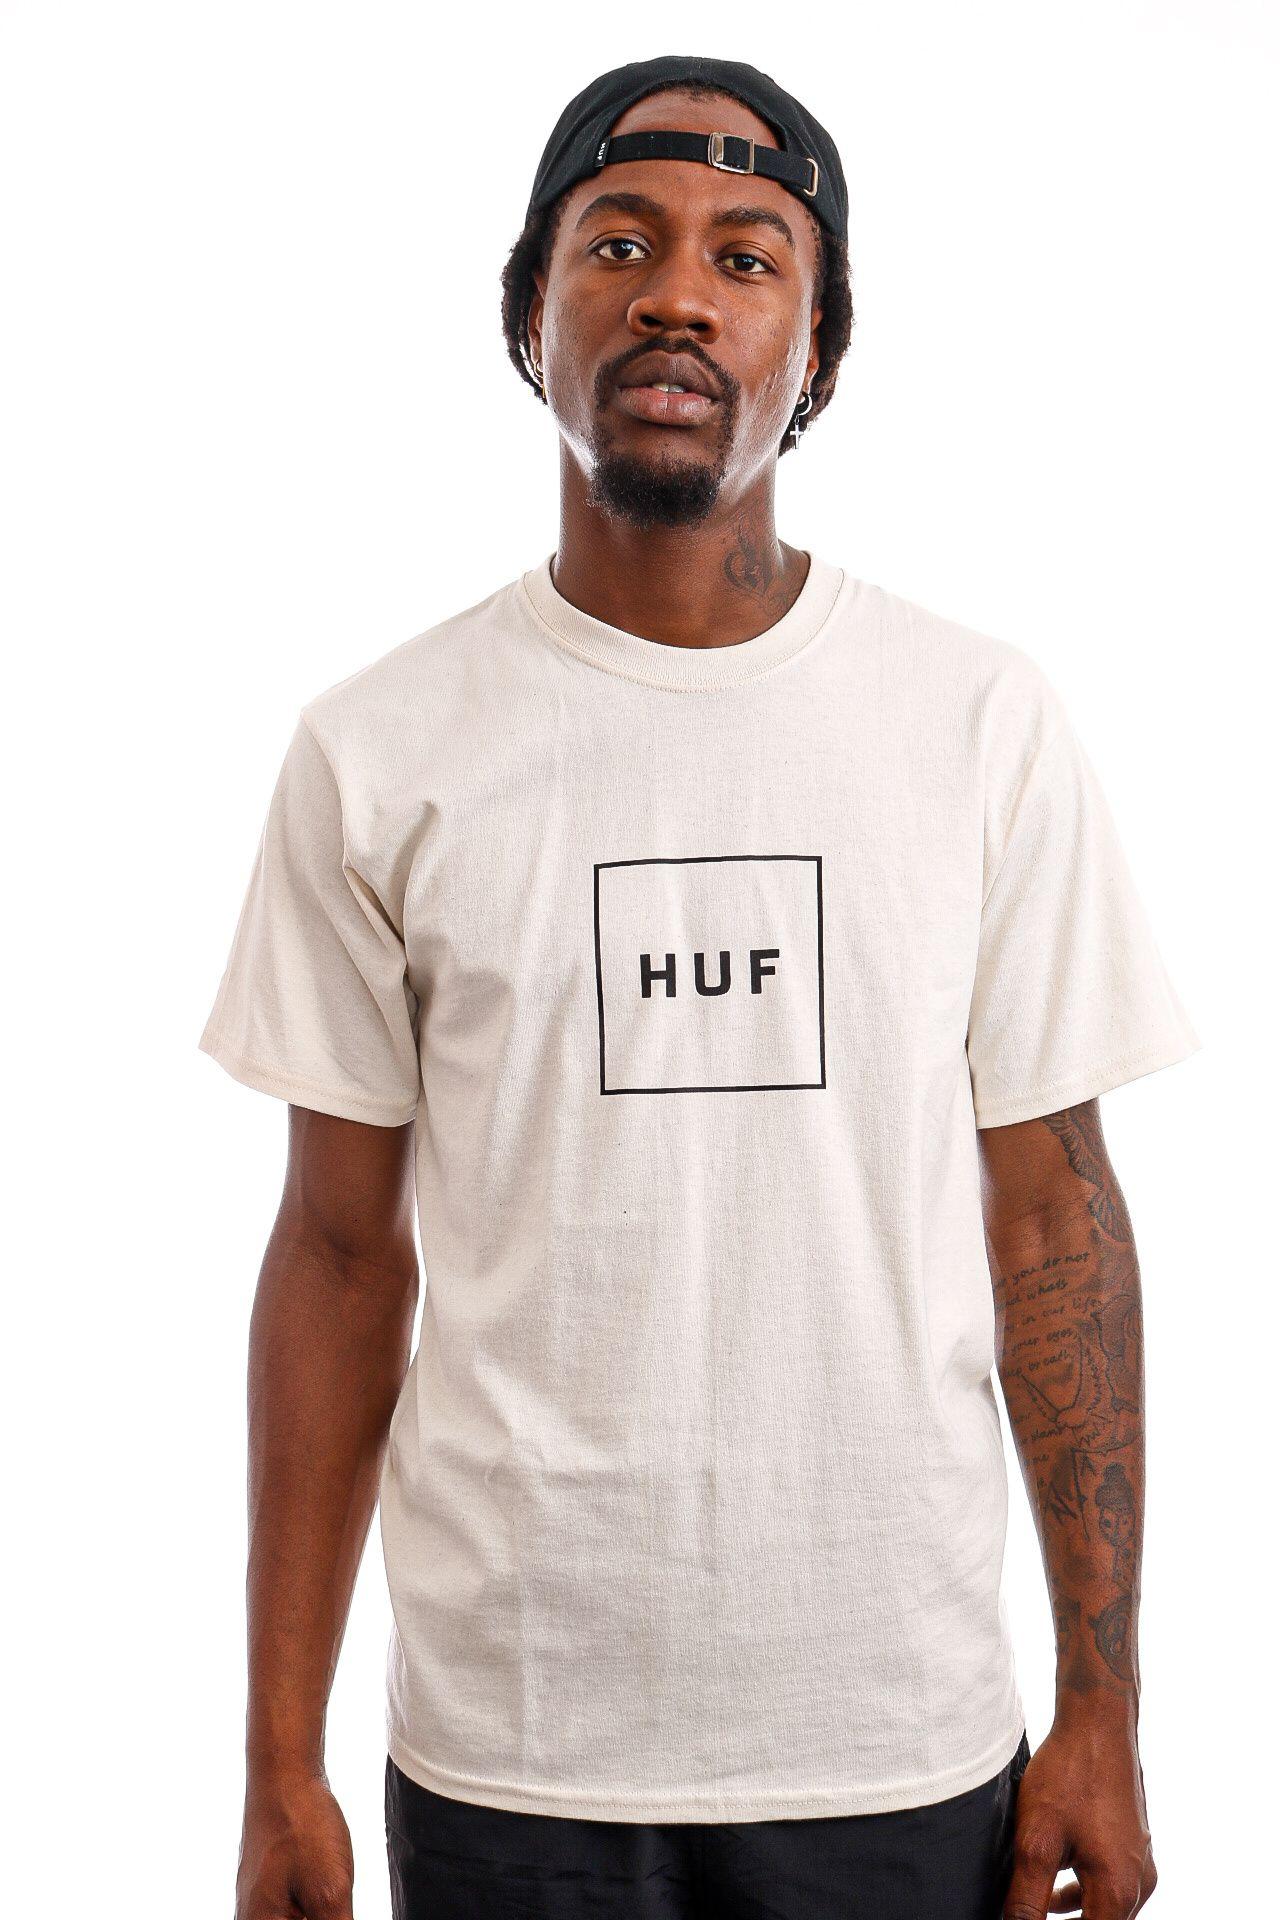 Afbeelding van HUF T-Shirt HUF ESSENTIALS BOX LOGO Natural TS00507